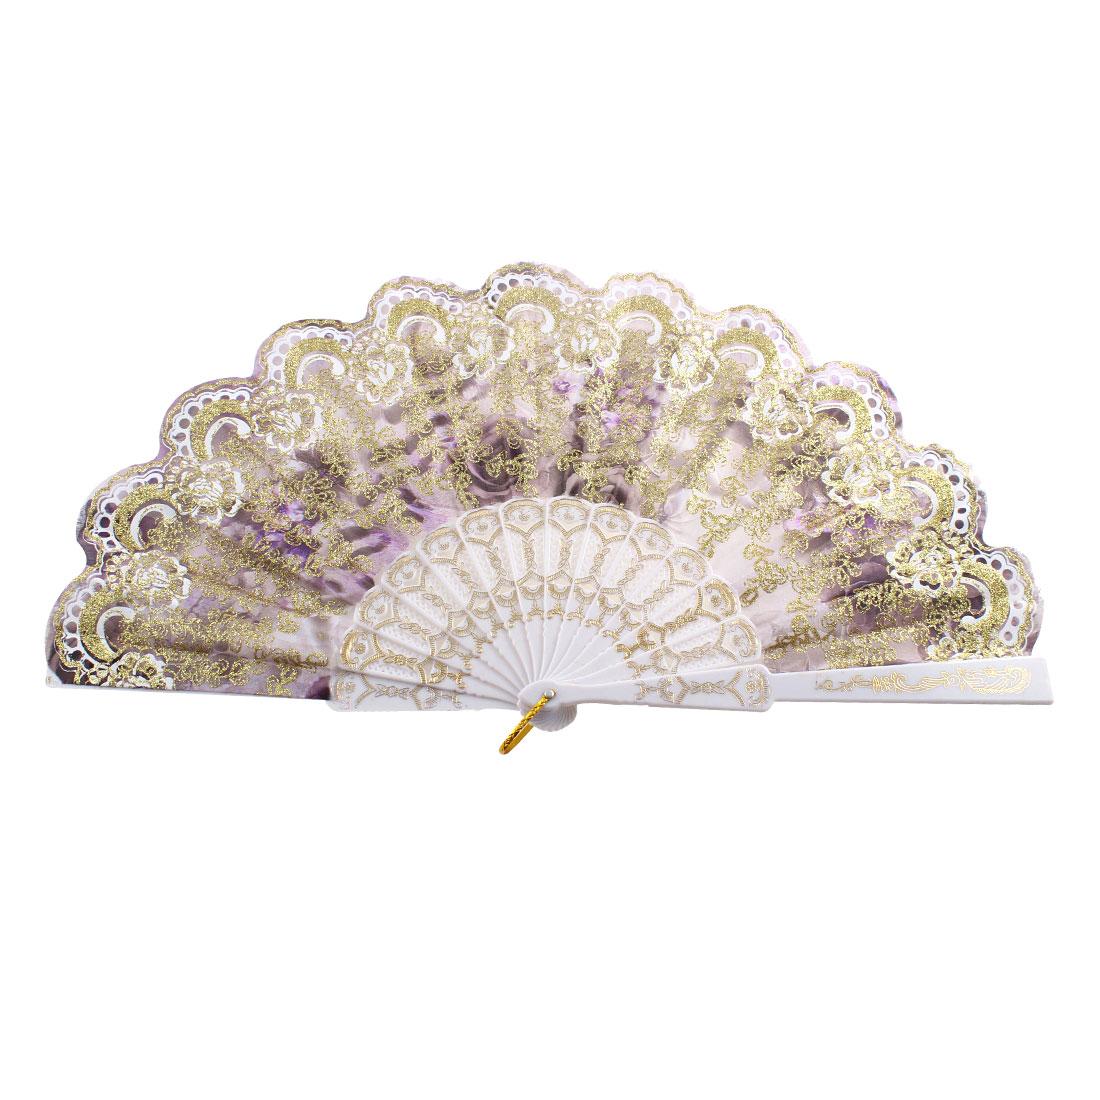 Gold Tone Glittery Powder Accent Leaf Printed Folded Dancing Hand Fan